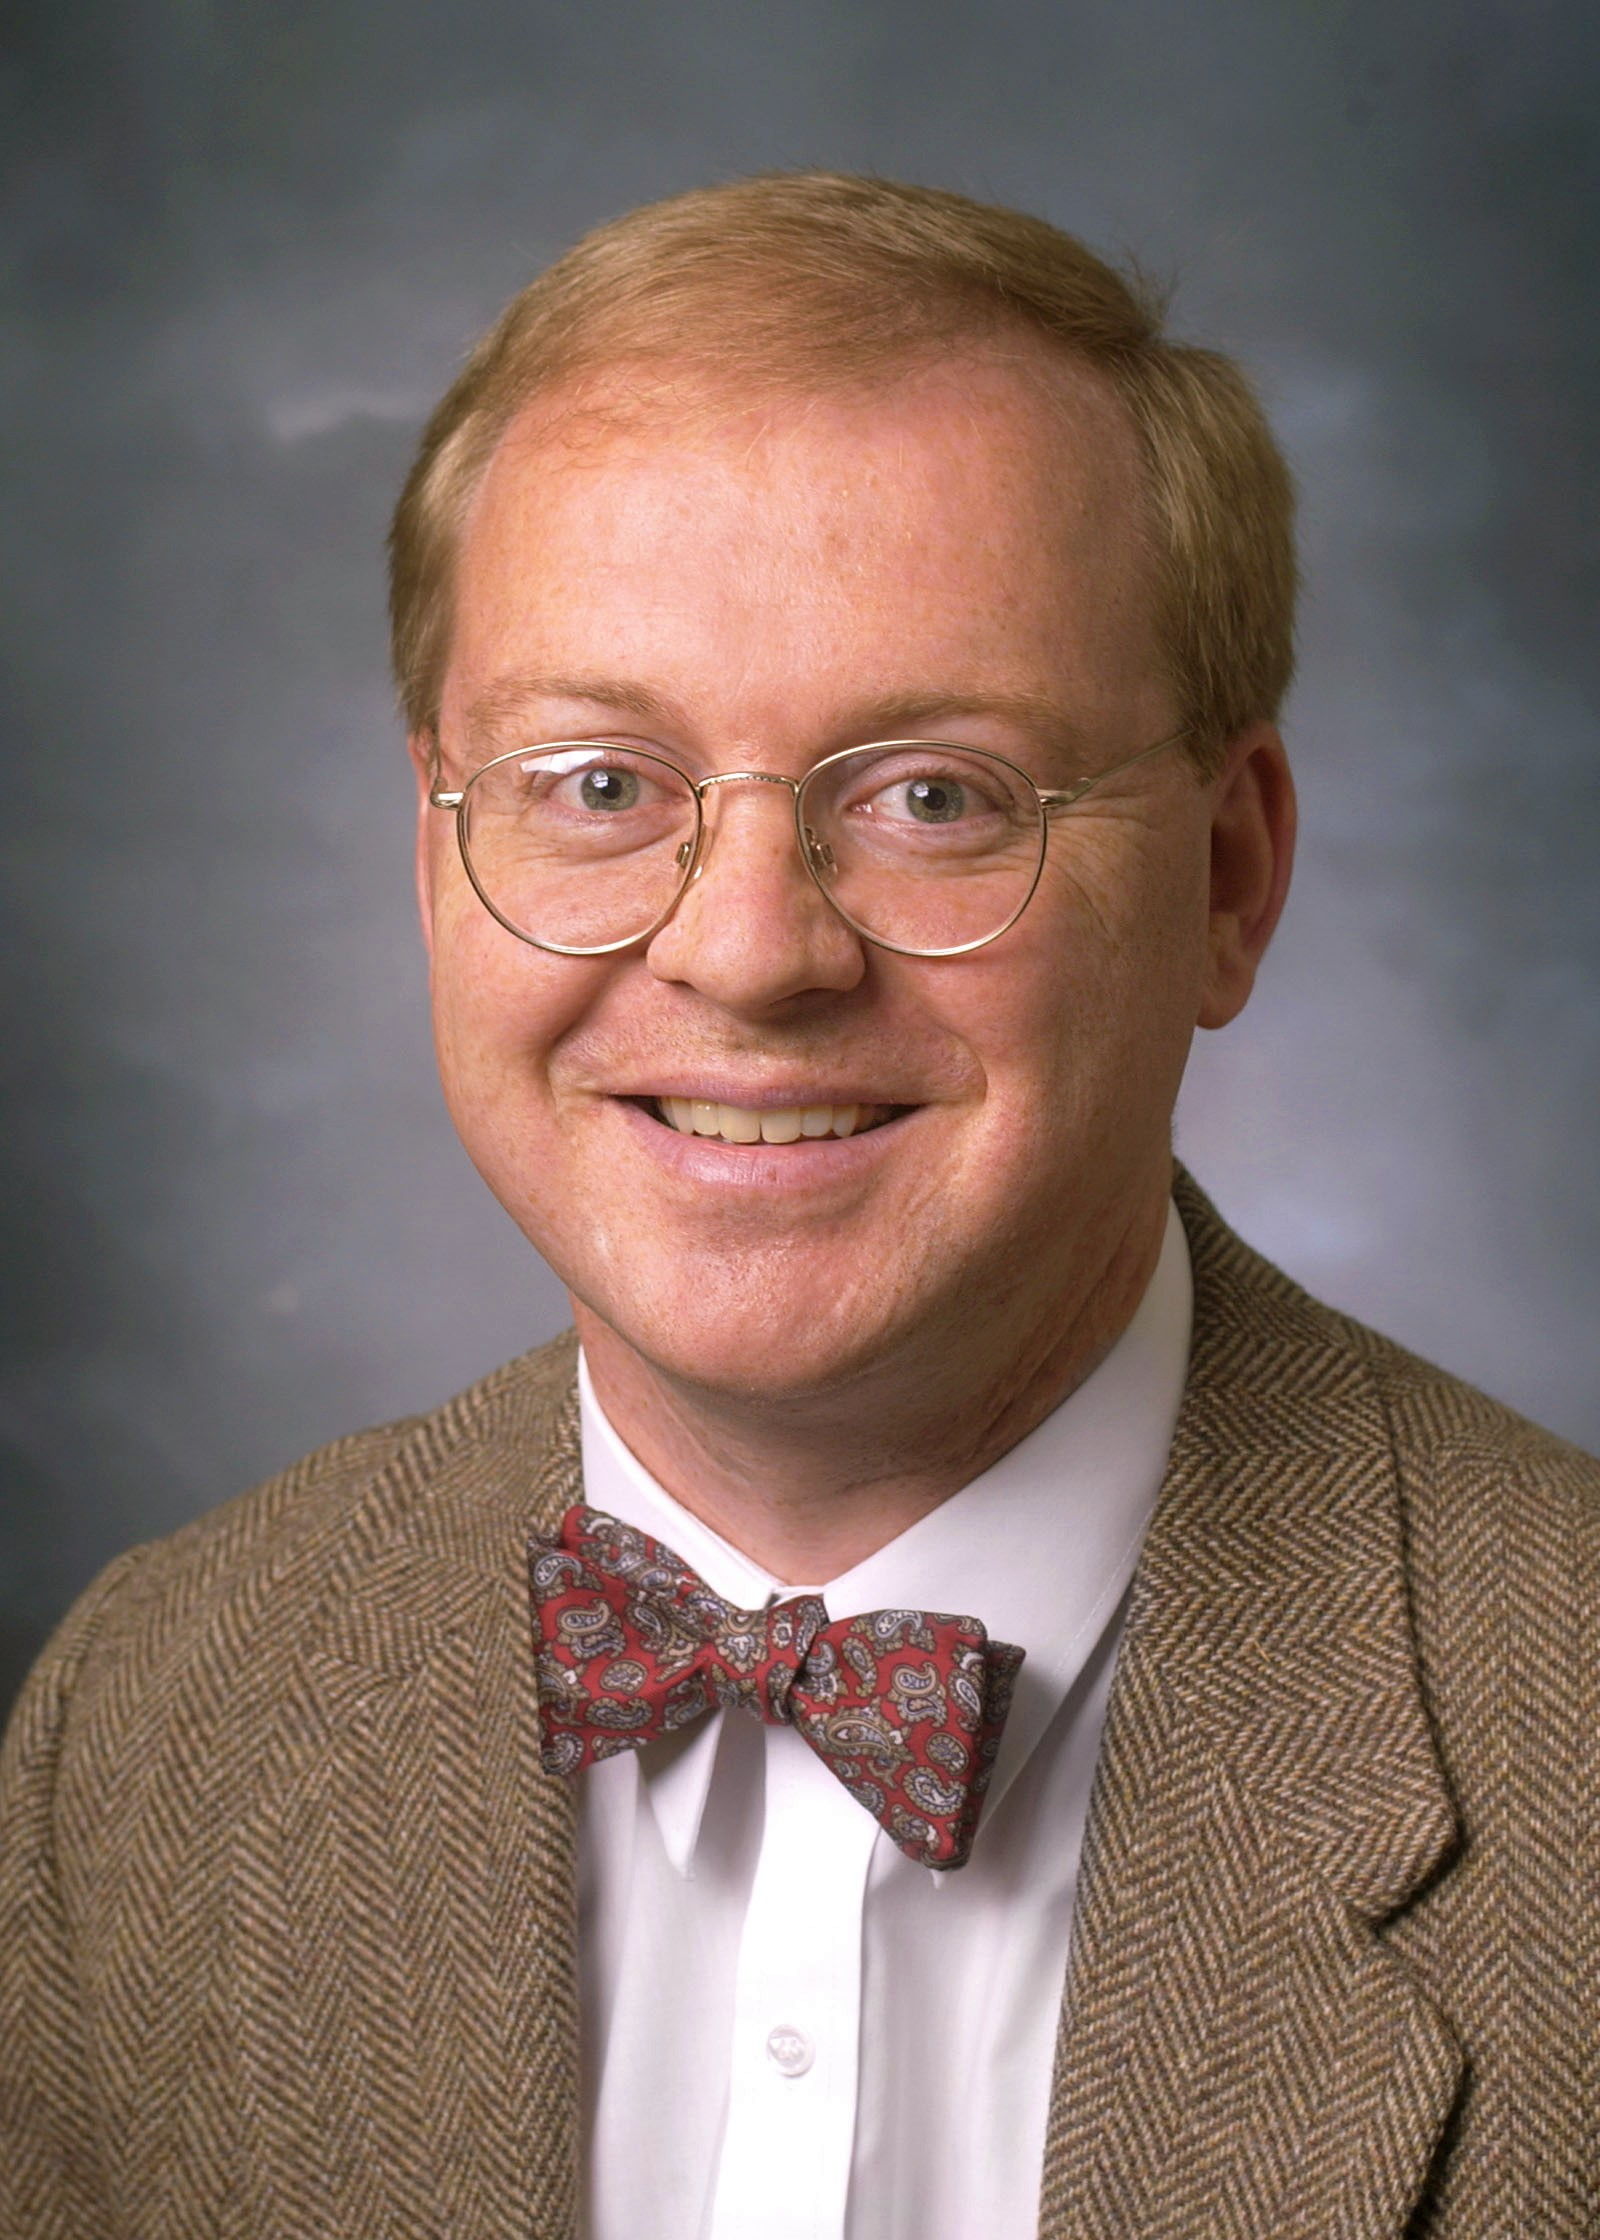 Dirk A. Elzinga